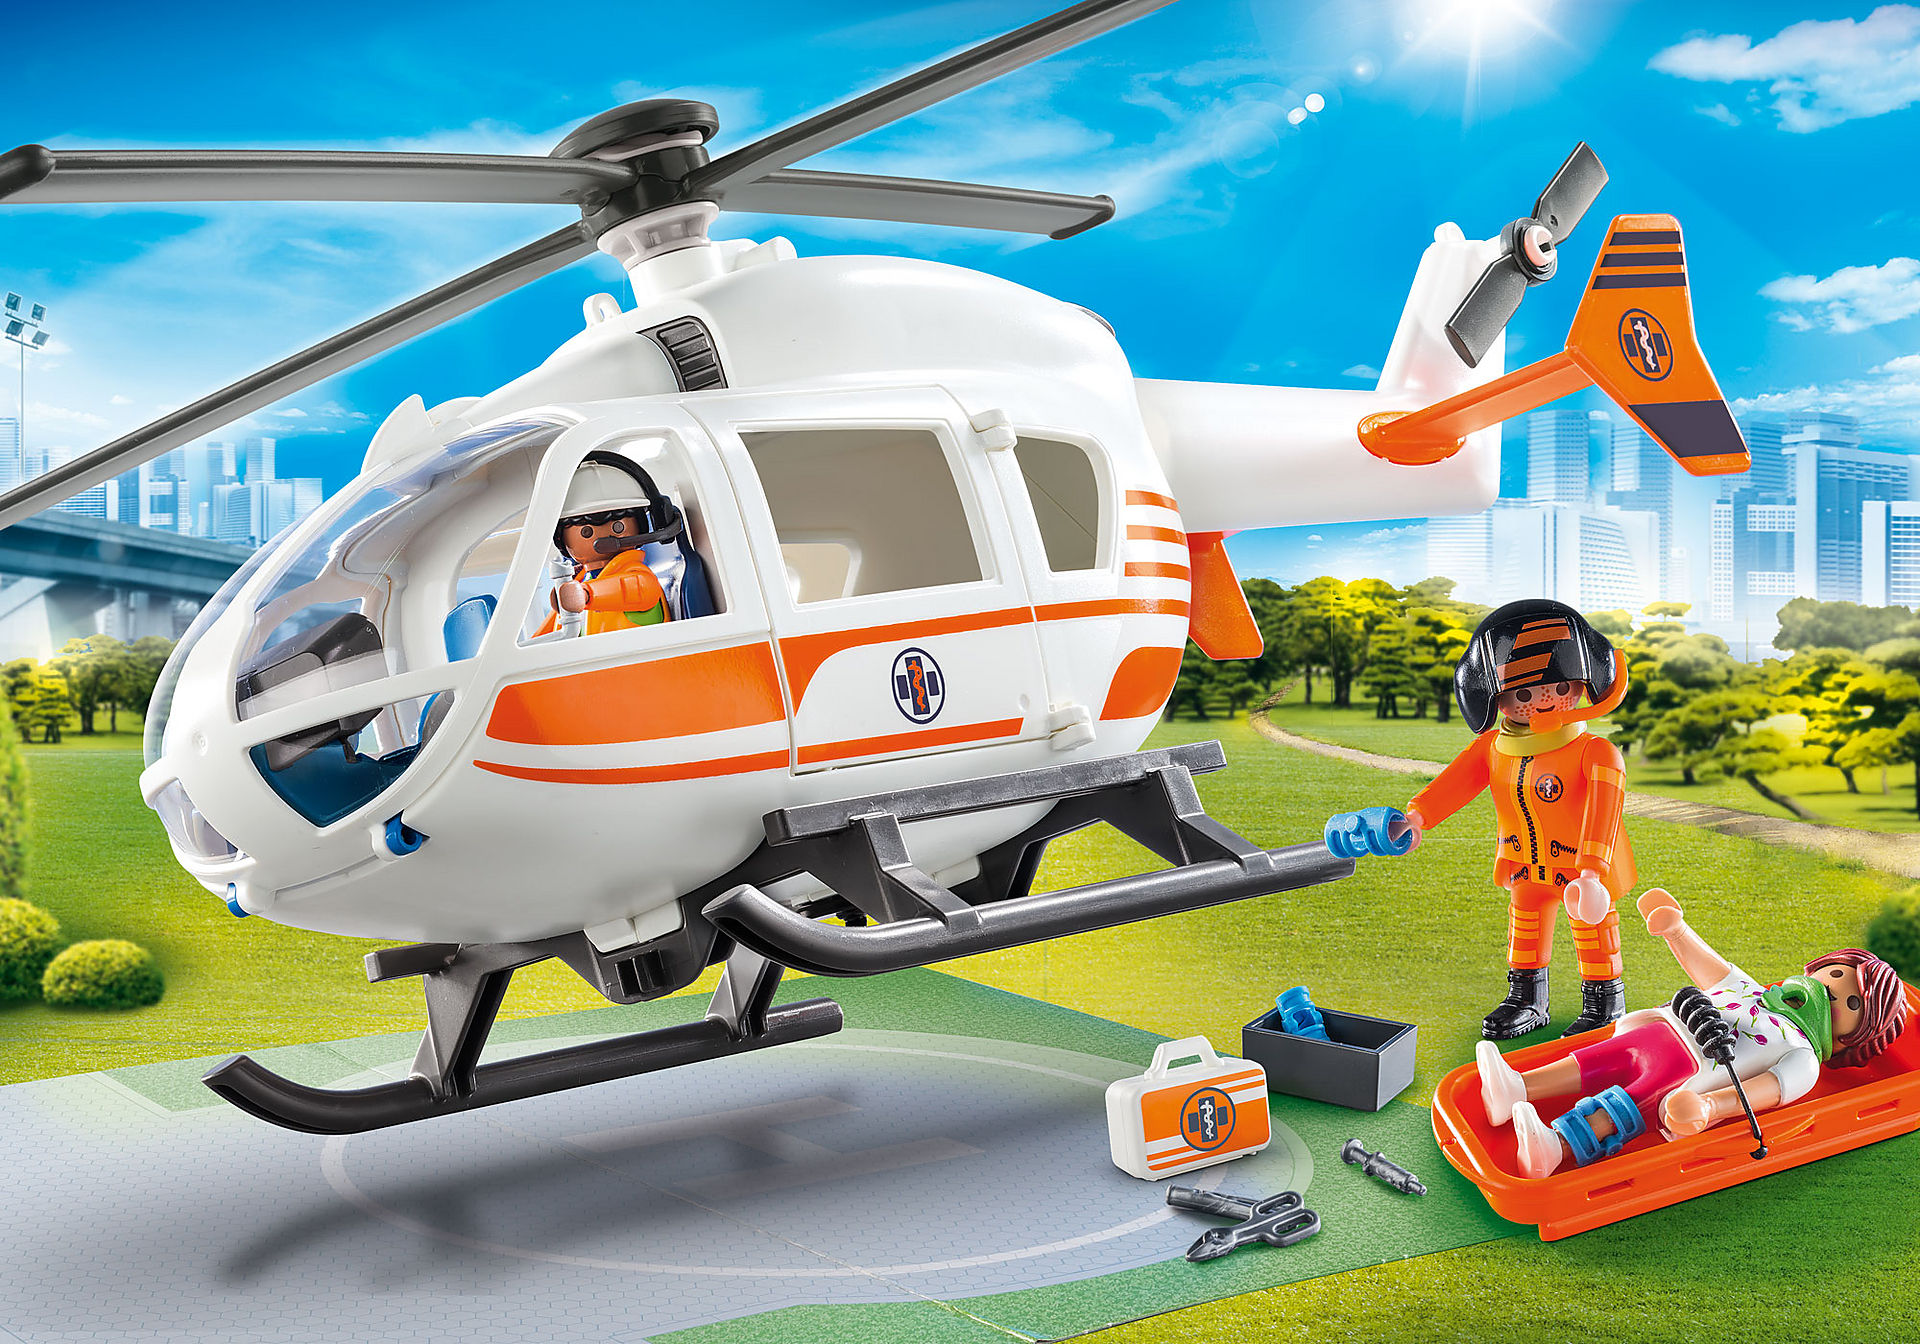 http://media.playmobil.com/i/playmobil/70048_product_detail/Rettungshelikopter